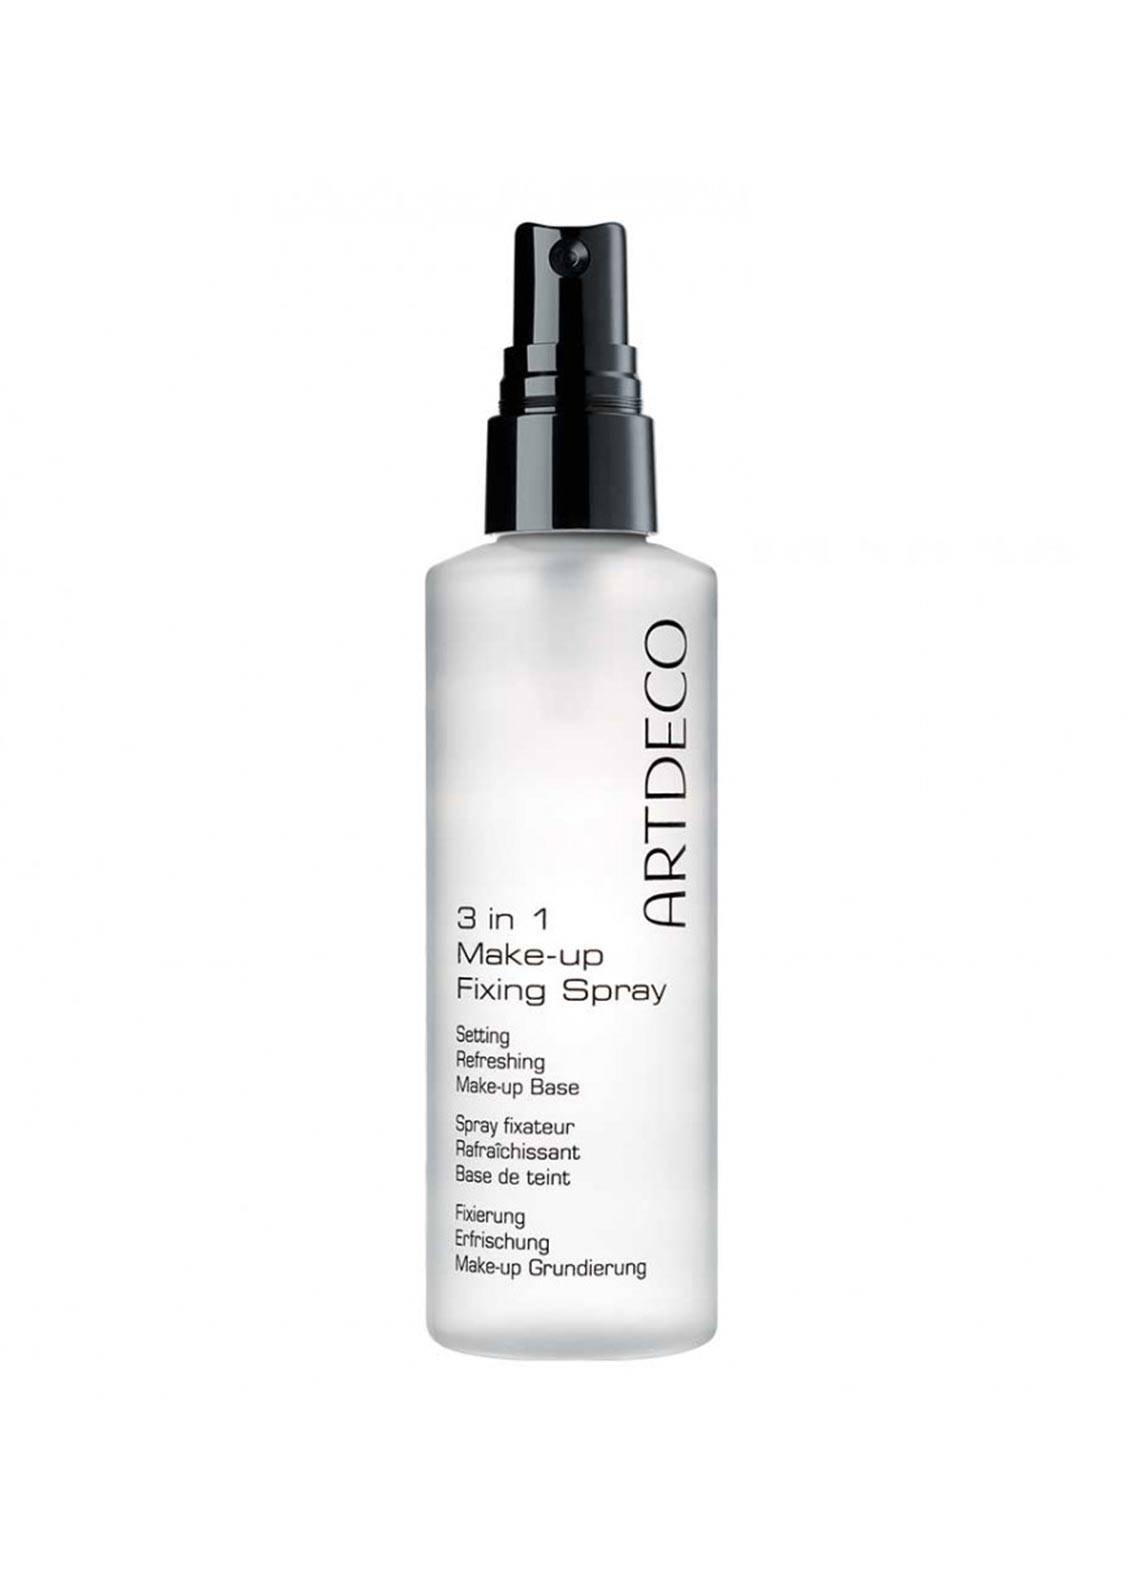 Artdeco 3 In 1 Make Up Fixing Spray 100ml